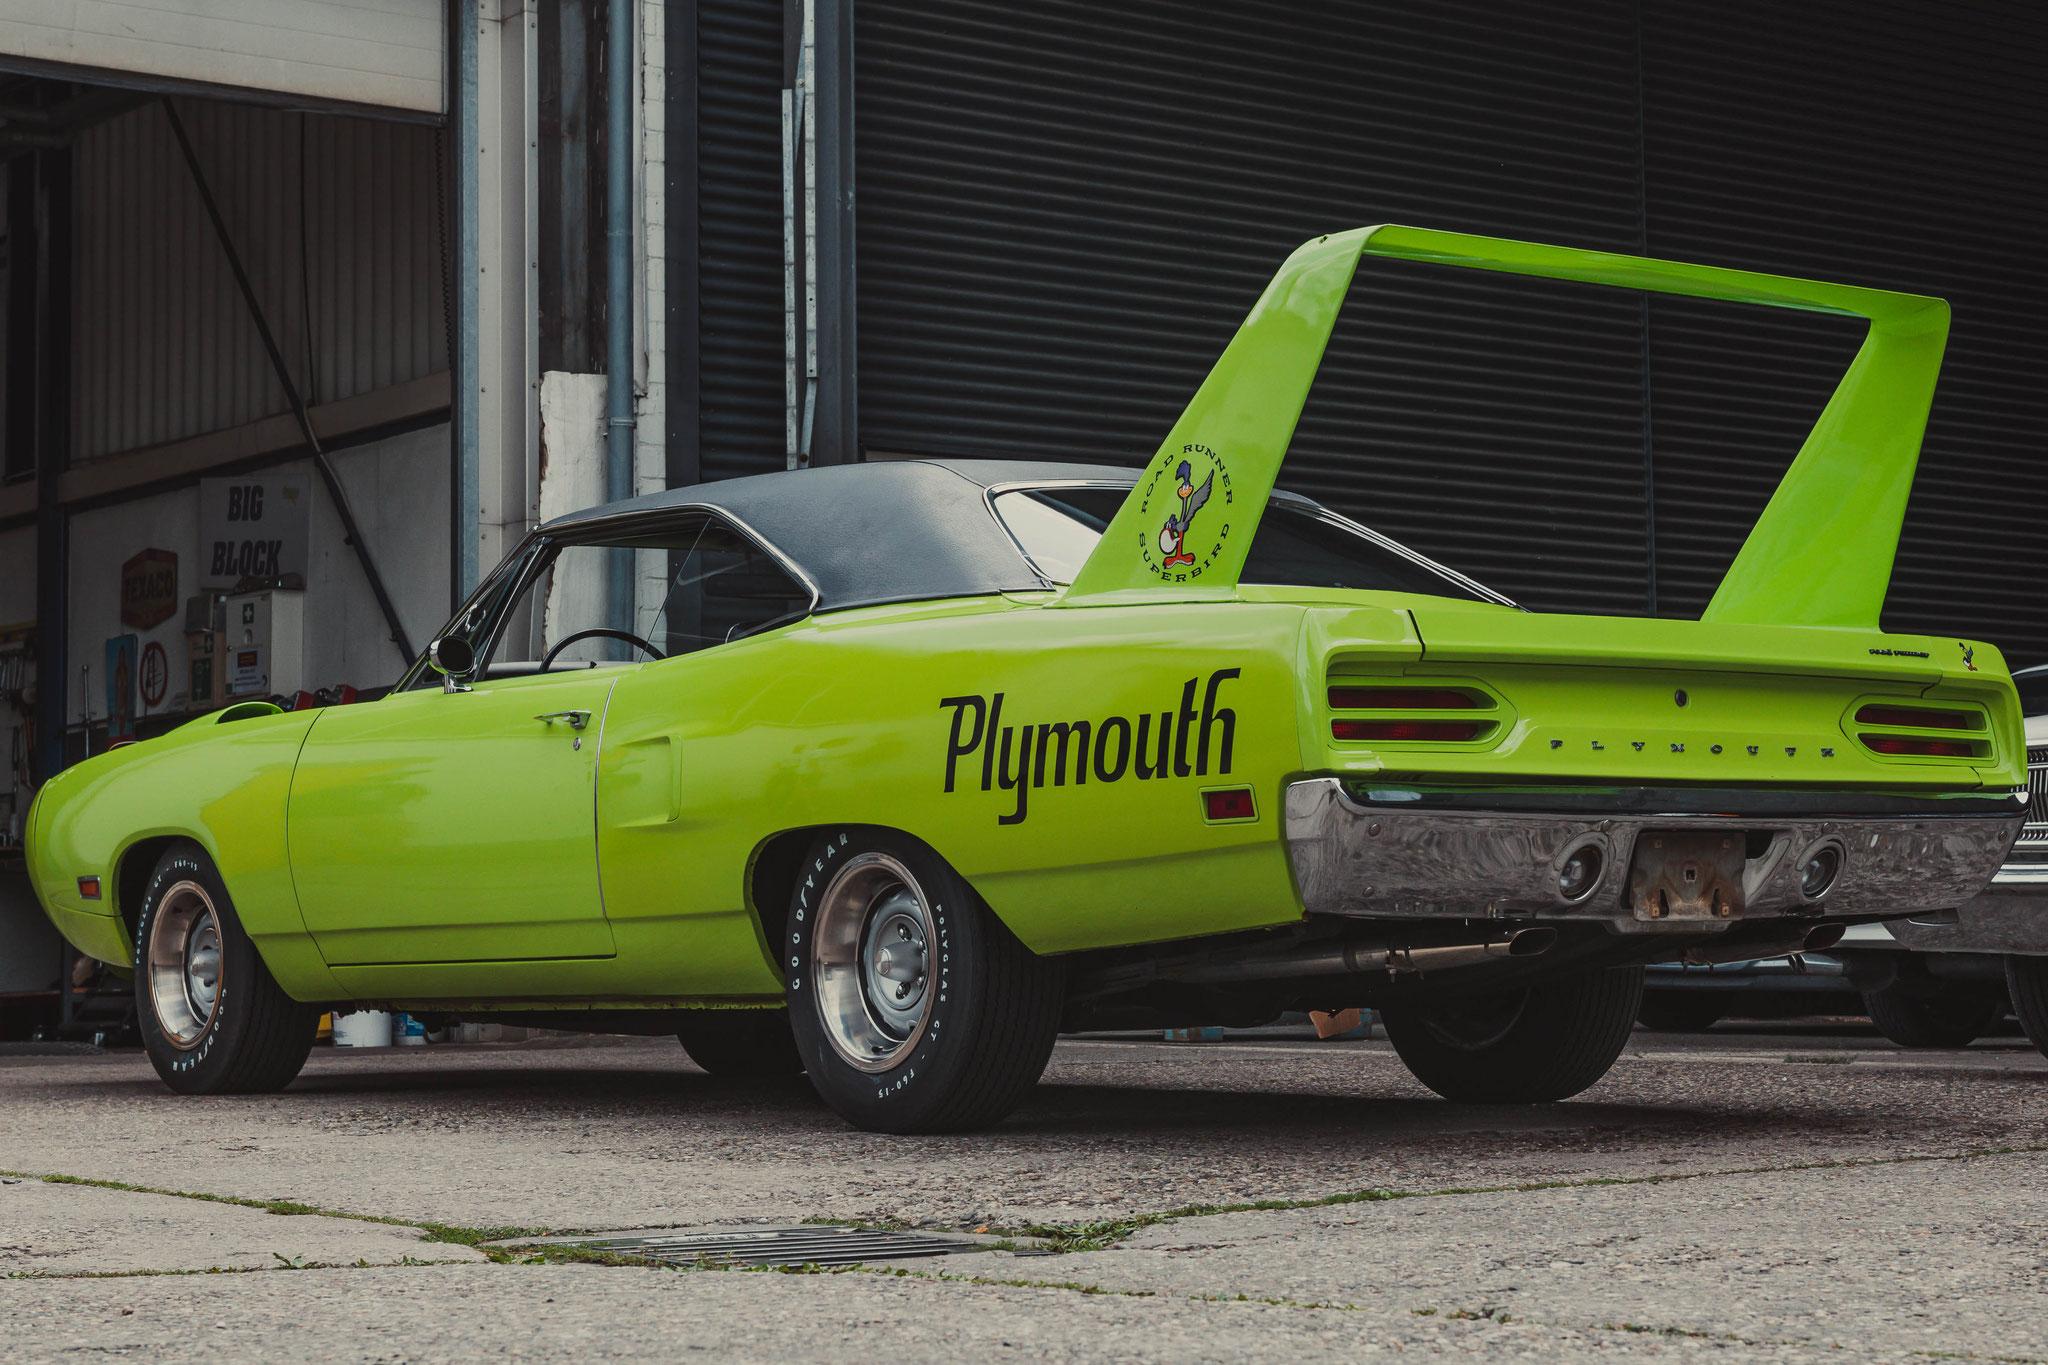 Plymouth Superbird vor der Werkstatt PEP Cars e. V. in Frankfurt